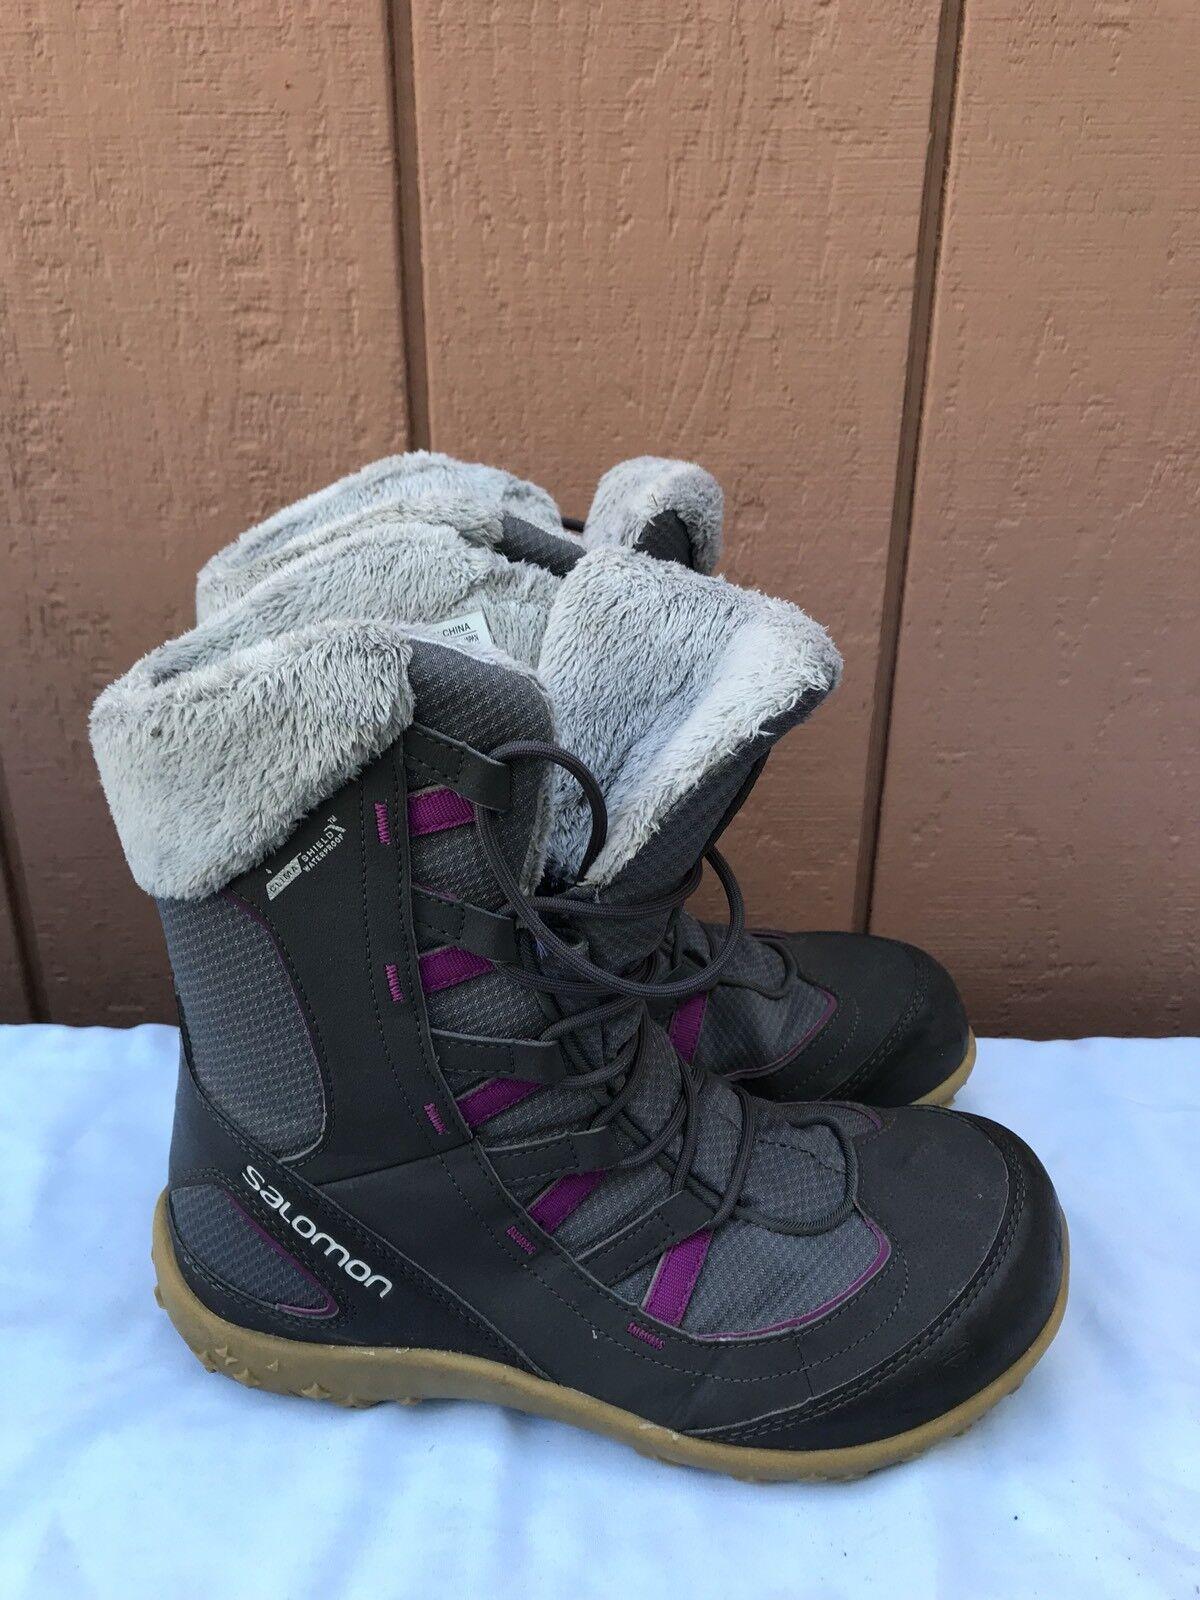 EUC Winter Salomon Women US 7.5 Winter EUC Boots Thinsulate Faux Fur Contagrip Sole Gray A7 6f64f8